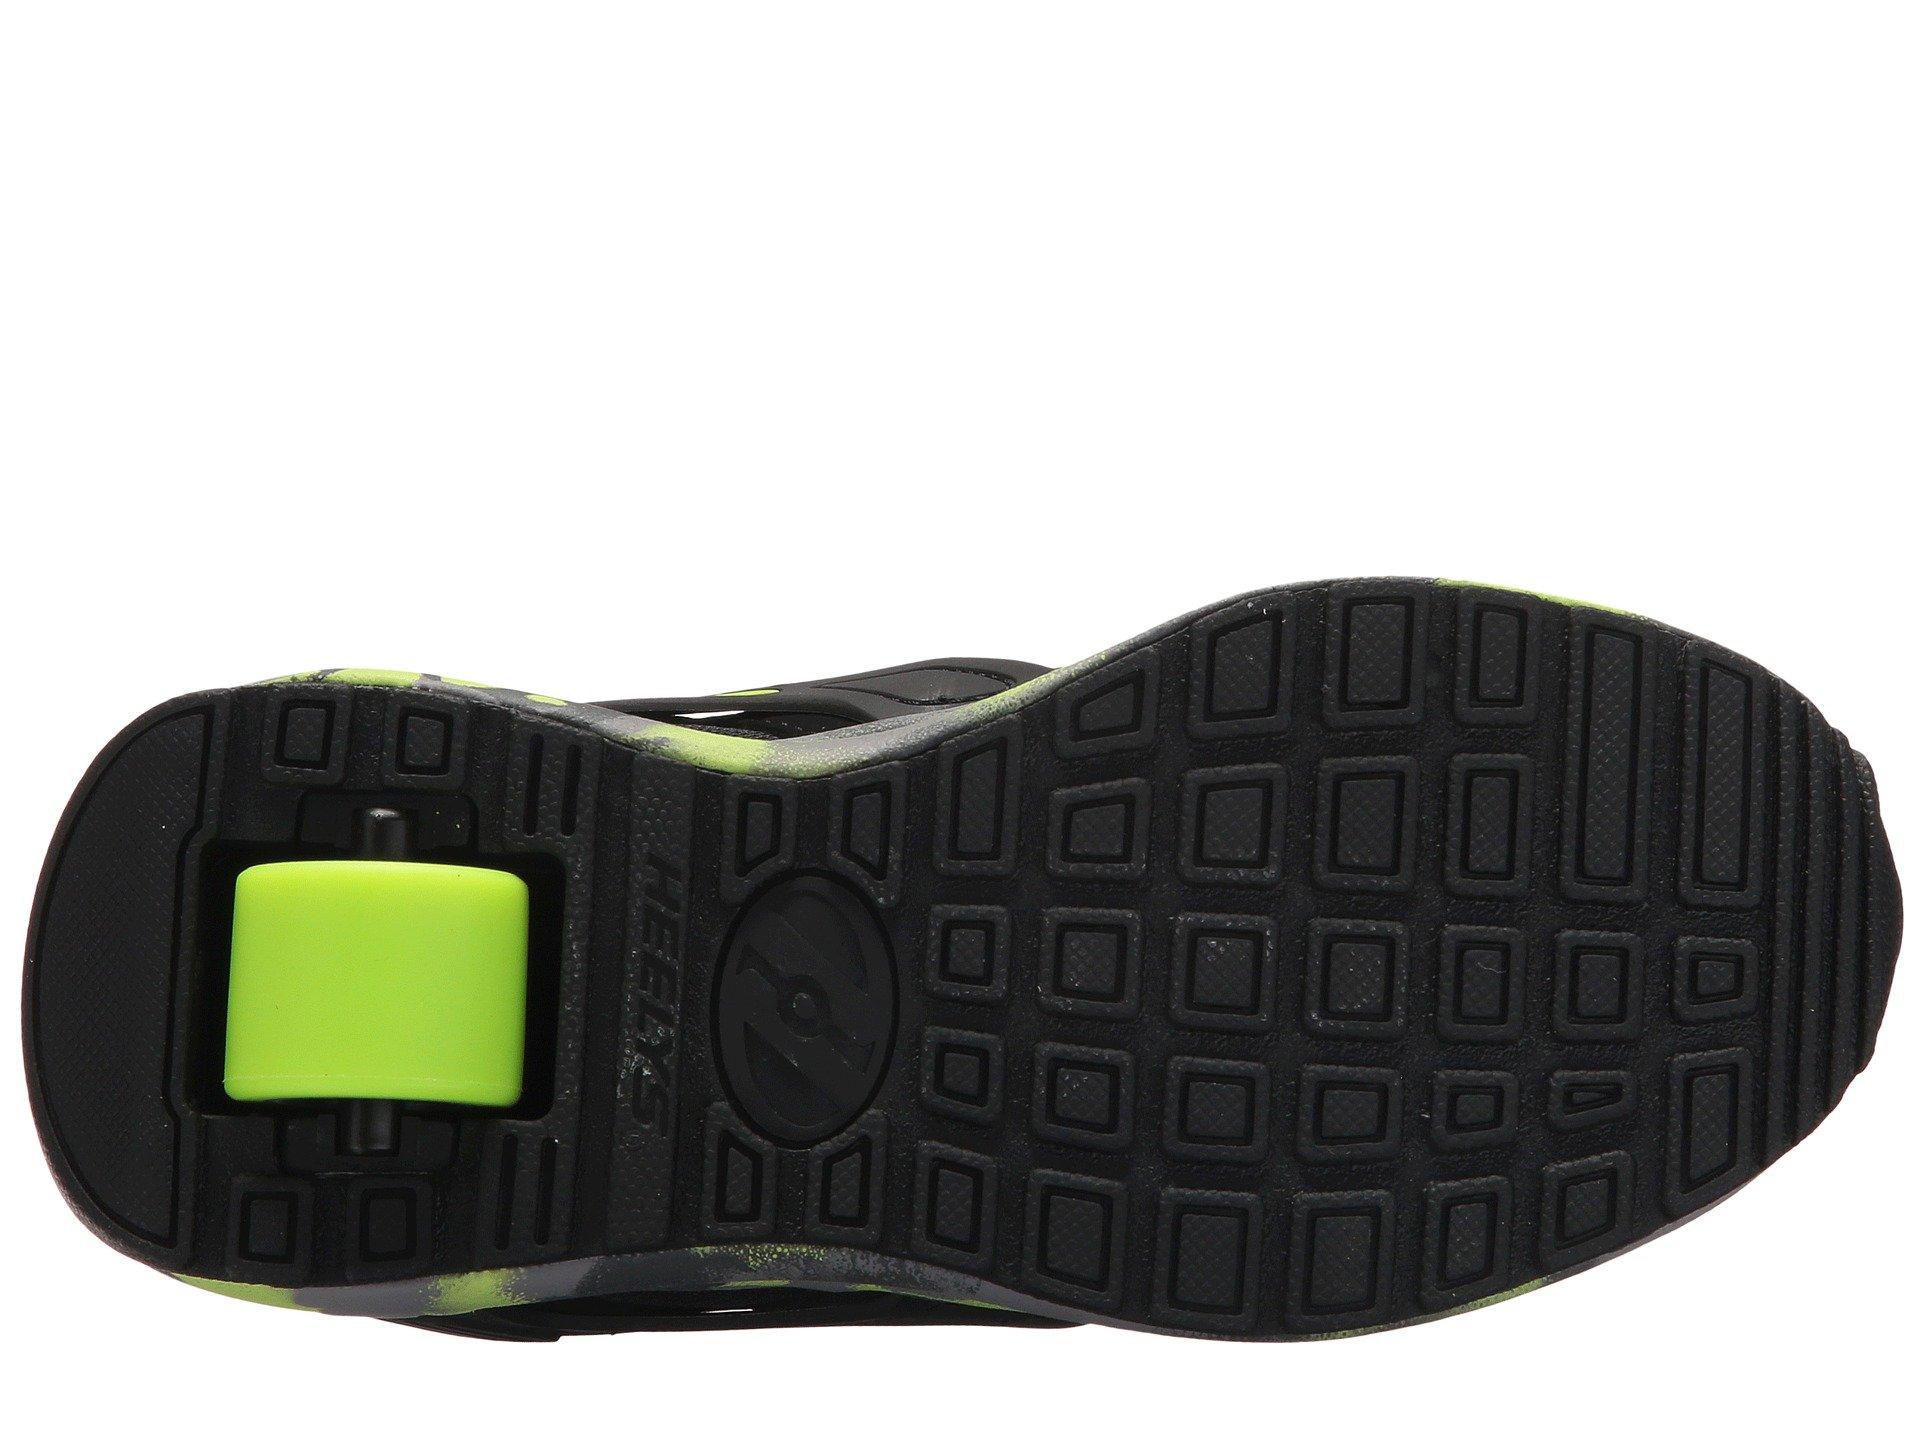 Heelys HE100095H Kid's Force Sneakers, Black/Brightyellow/Confet - 8 by Heelys (Image #4)